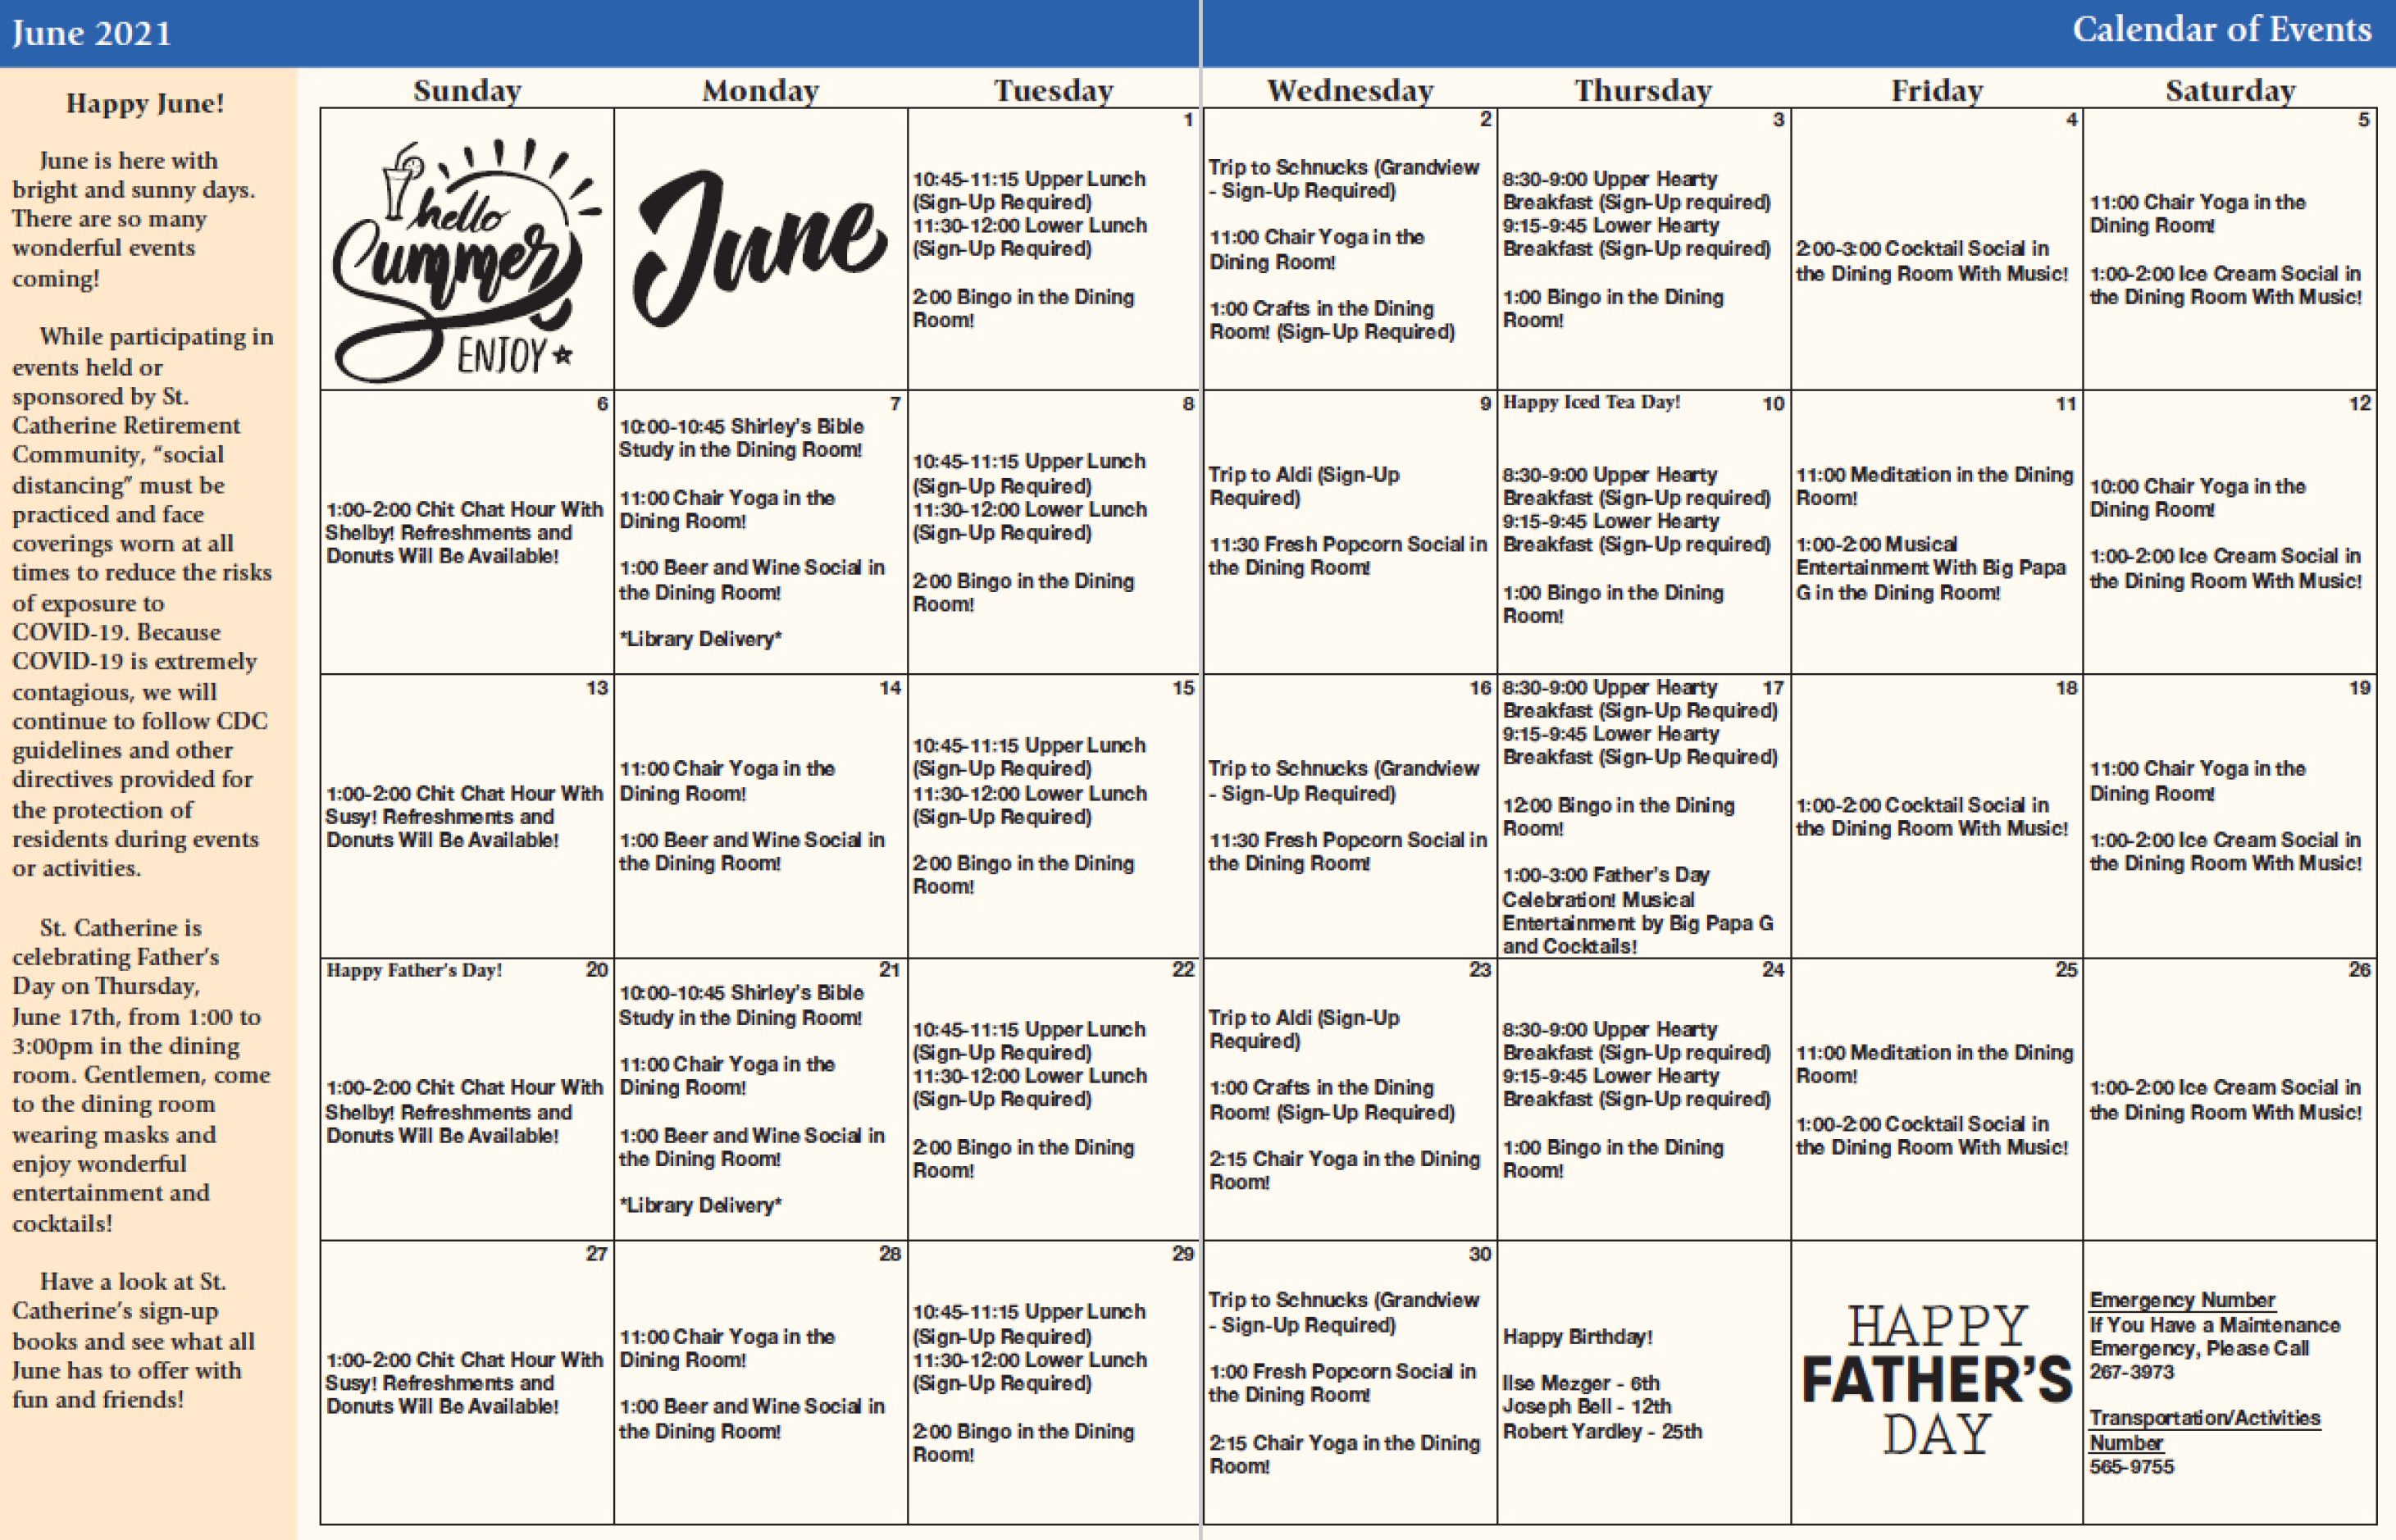 St. Catherine June 2021 Calendar